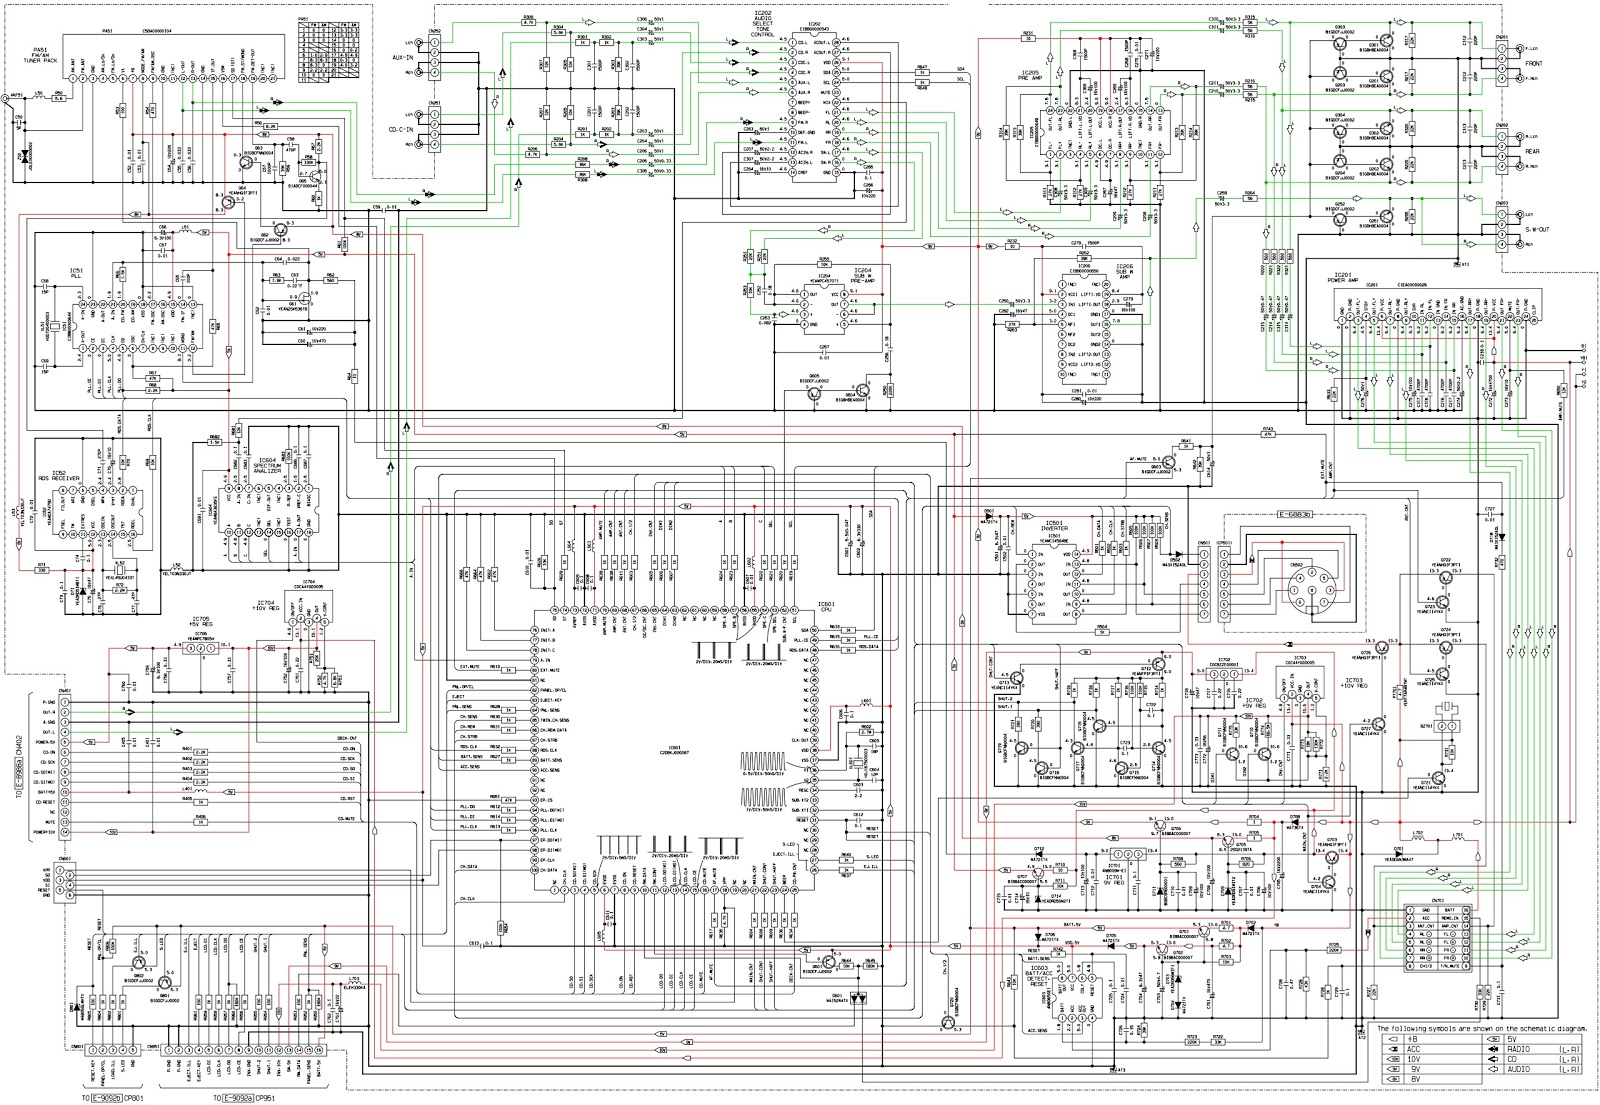 panasonic tv circuit diagram example electrical wiring diagram u2022 2000 chevy impala fuse box diagram 1957 corvette wiring diagram  [ 1600 x 1105 Pixel ]